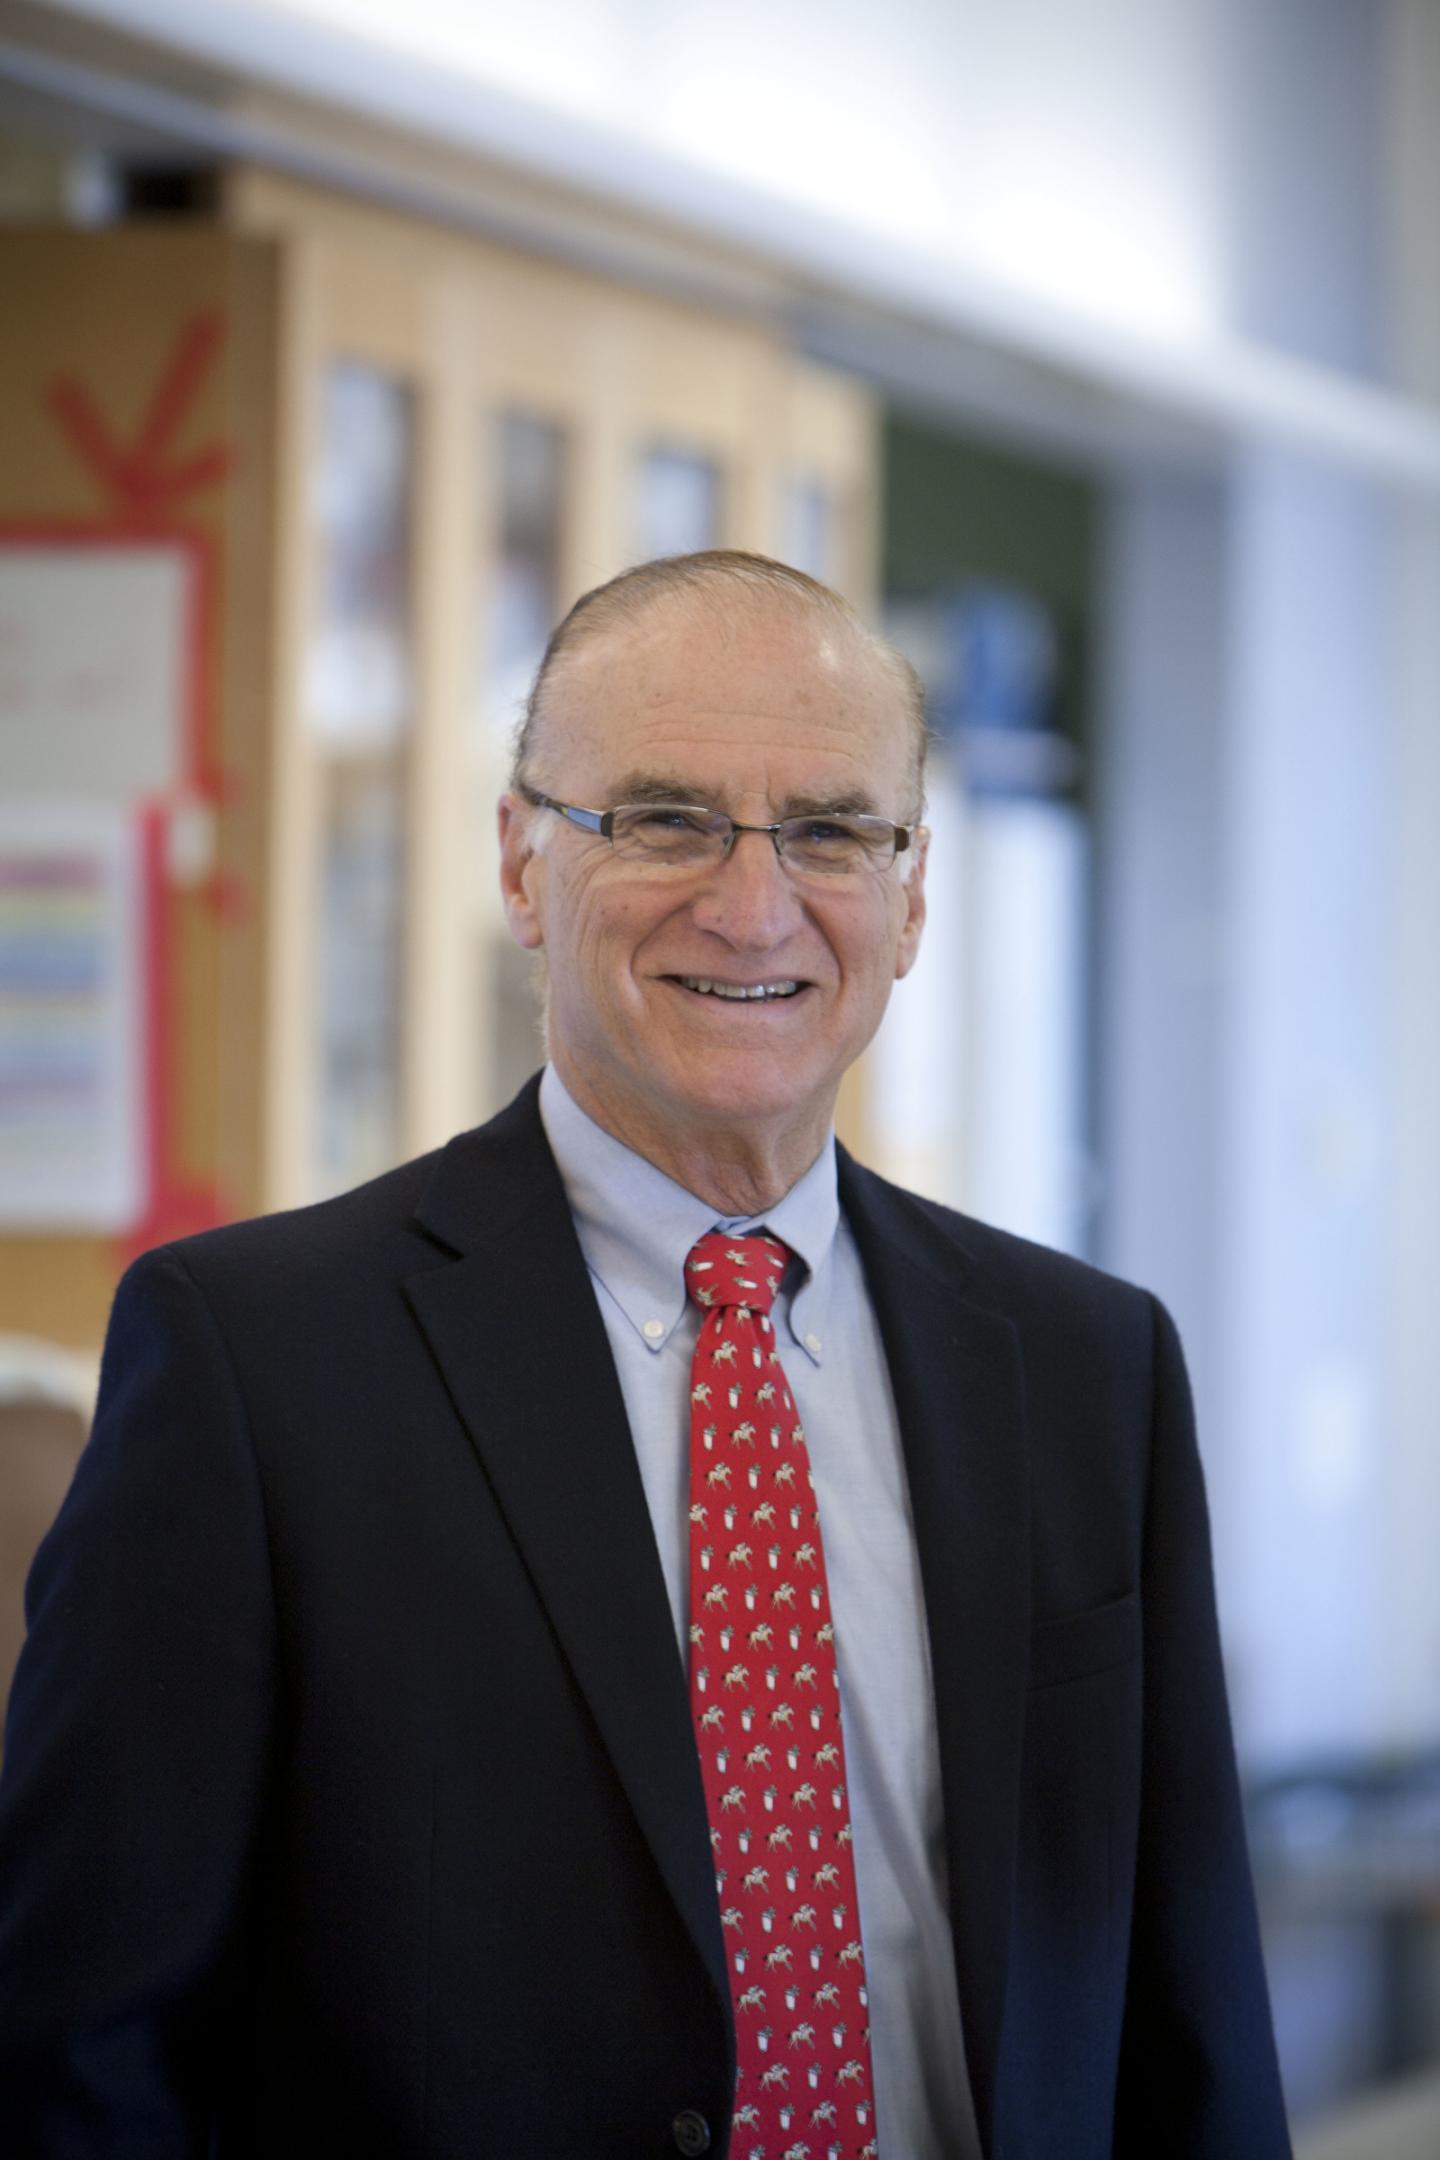 C. Ronald Kahn, Joslin Diabetes Center